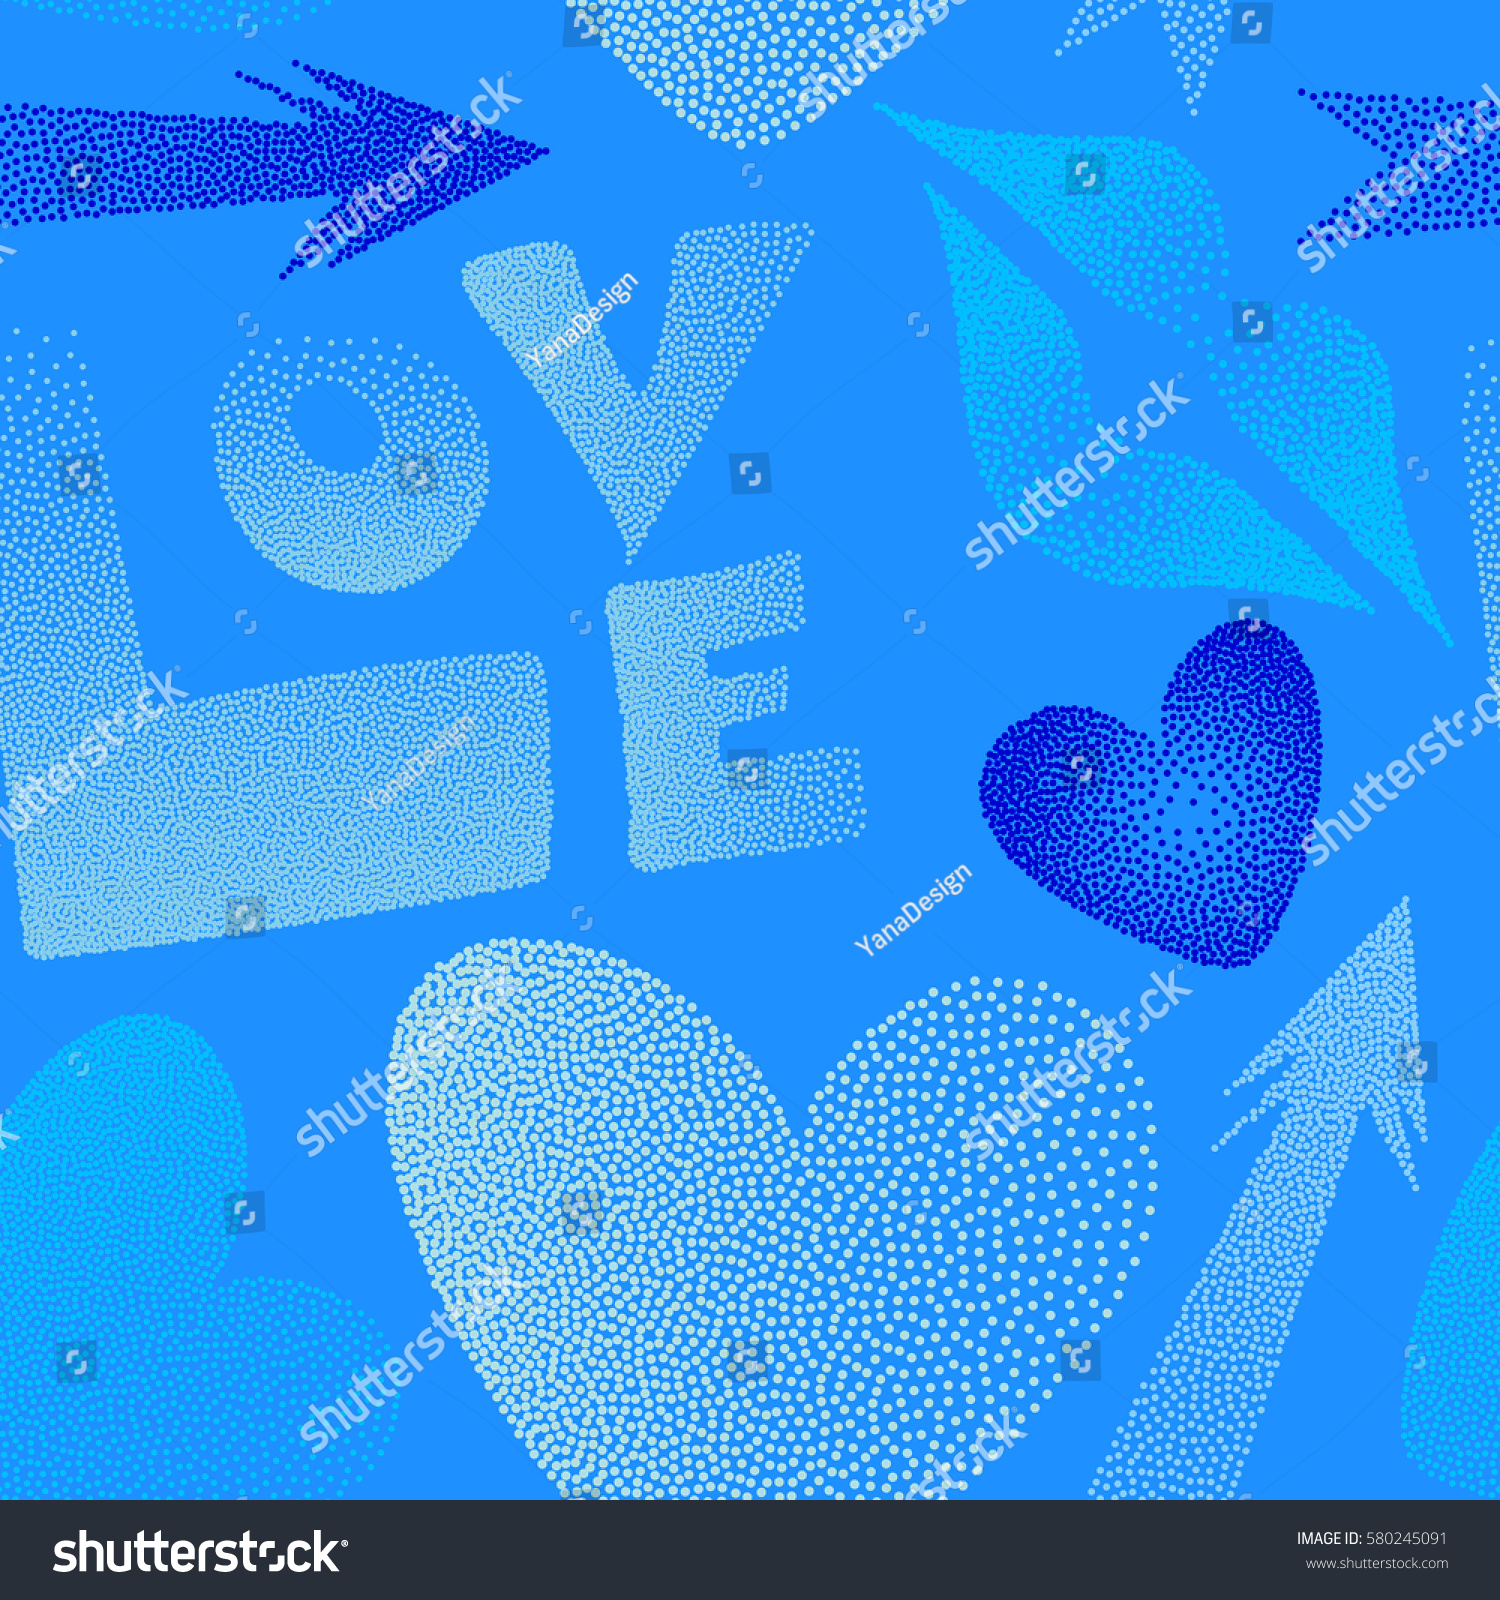 Romantic Love Symbols Blue Colors Vector Stock Vector 2018